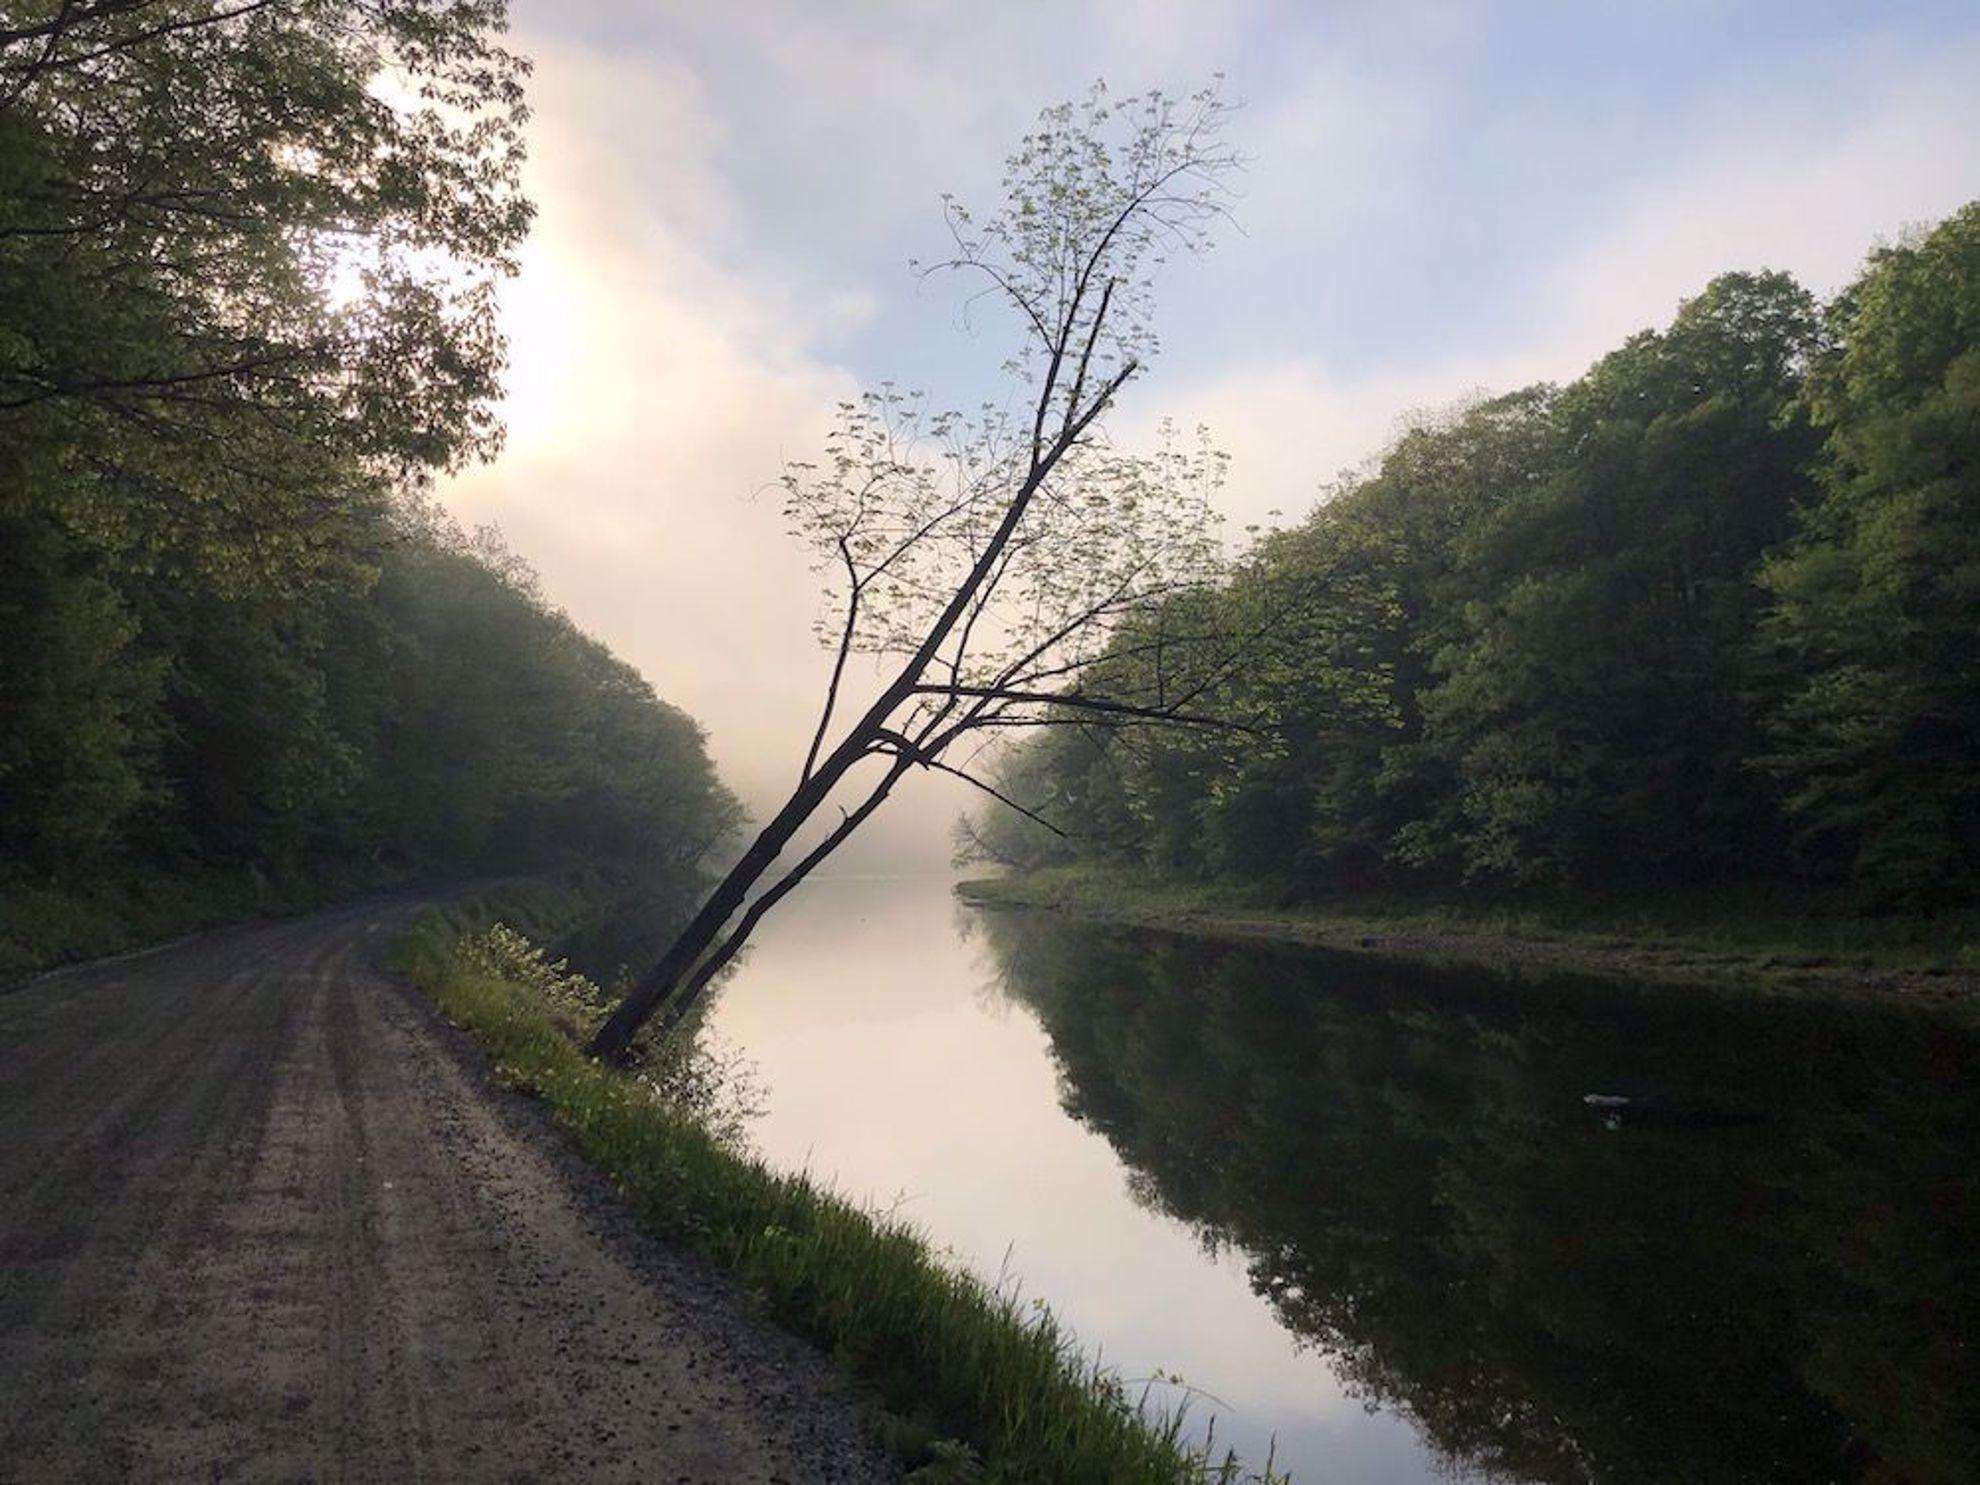 Sunrise by the Ottauquechee River, Woodstock